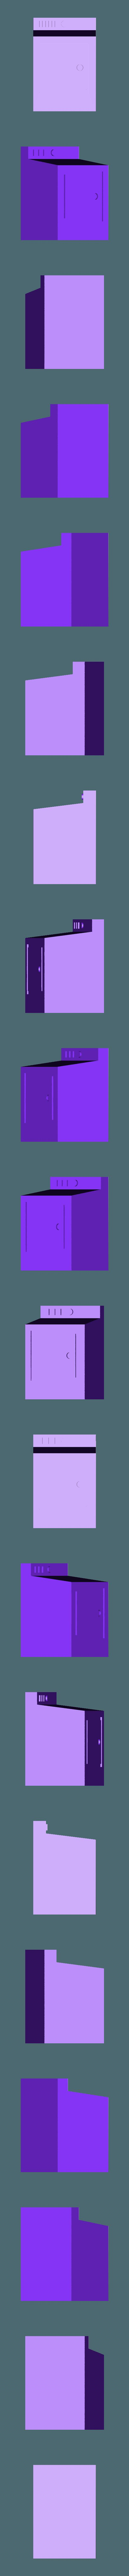 WashingMachine2.stl Download free STL file Rick and Morty Garage • 3D printable object, lucadilorenzo98